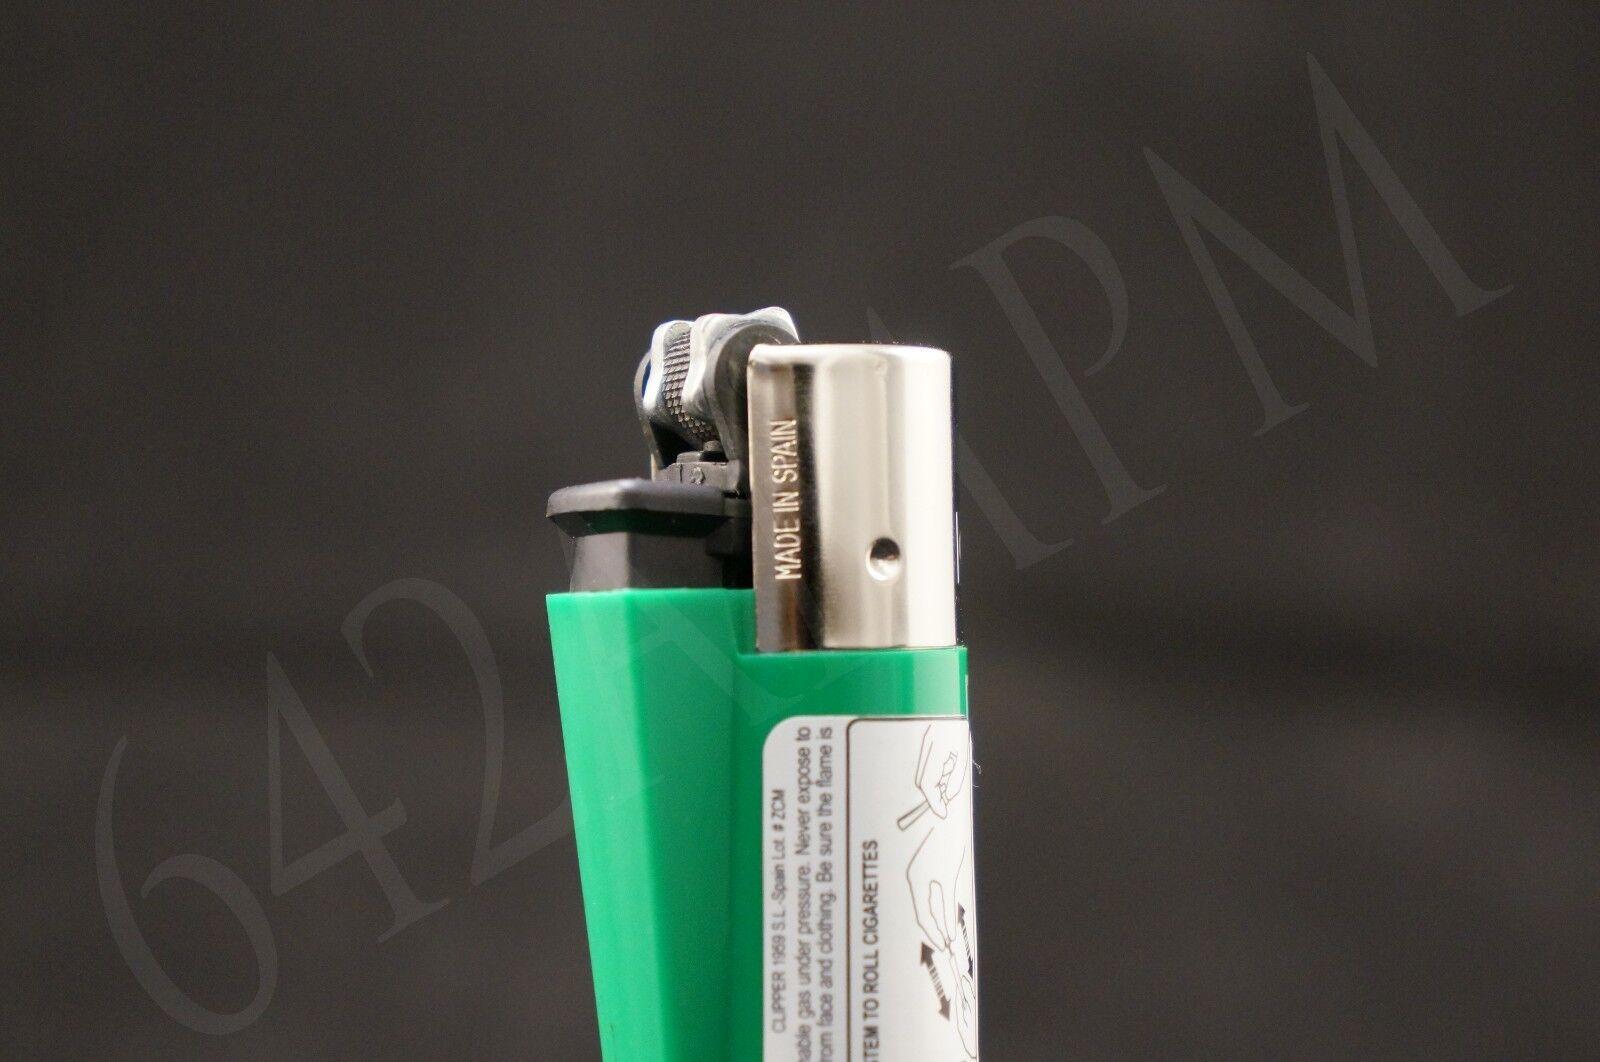 4 pcs New Refillable Clipper Full Size Lighters Atari Design